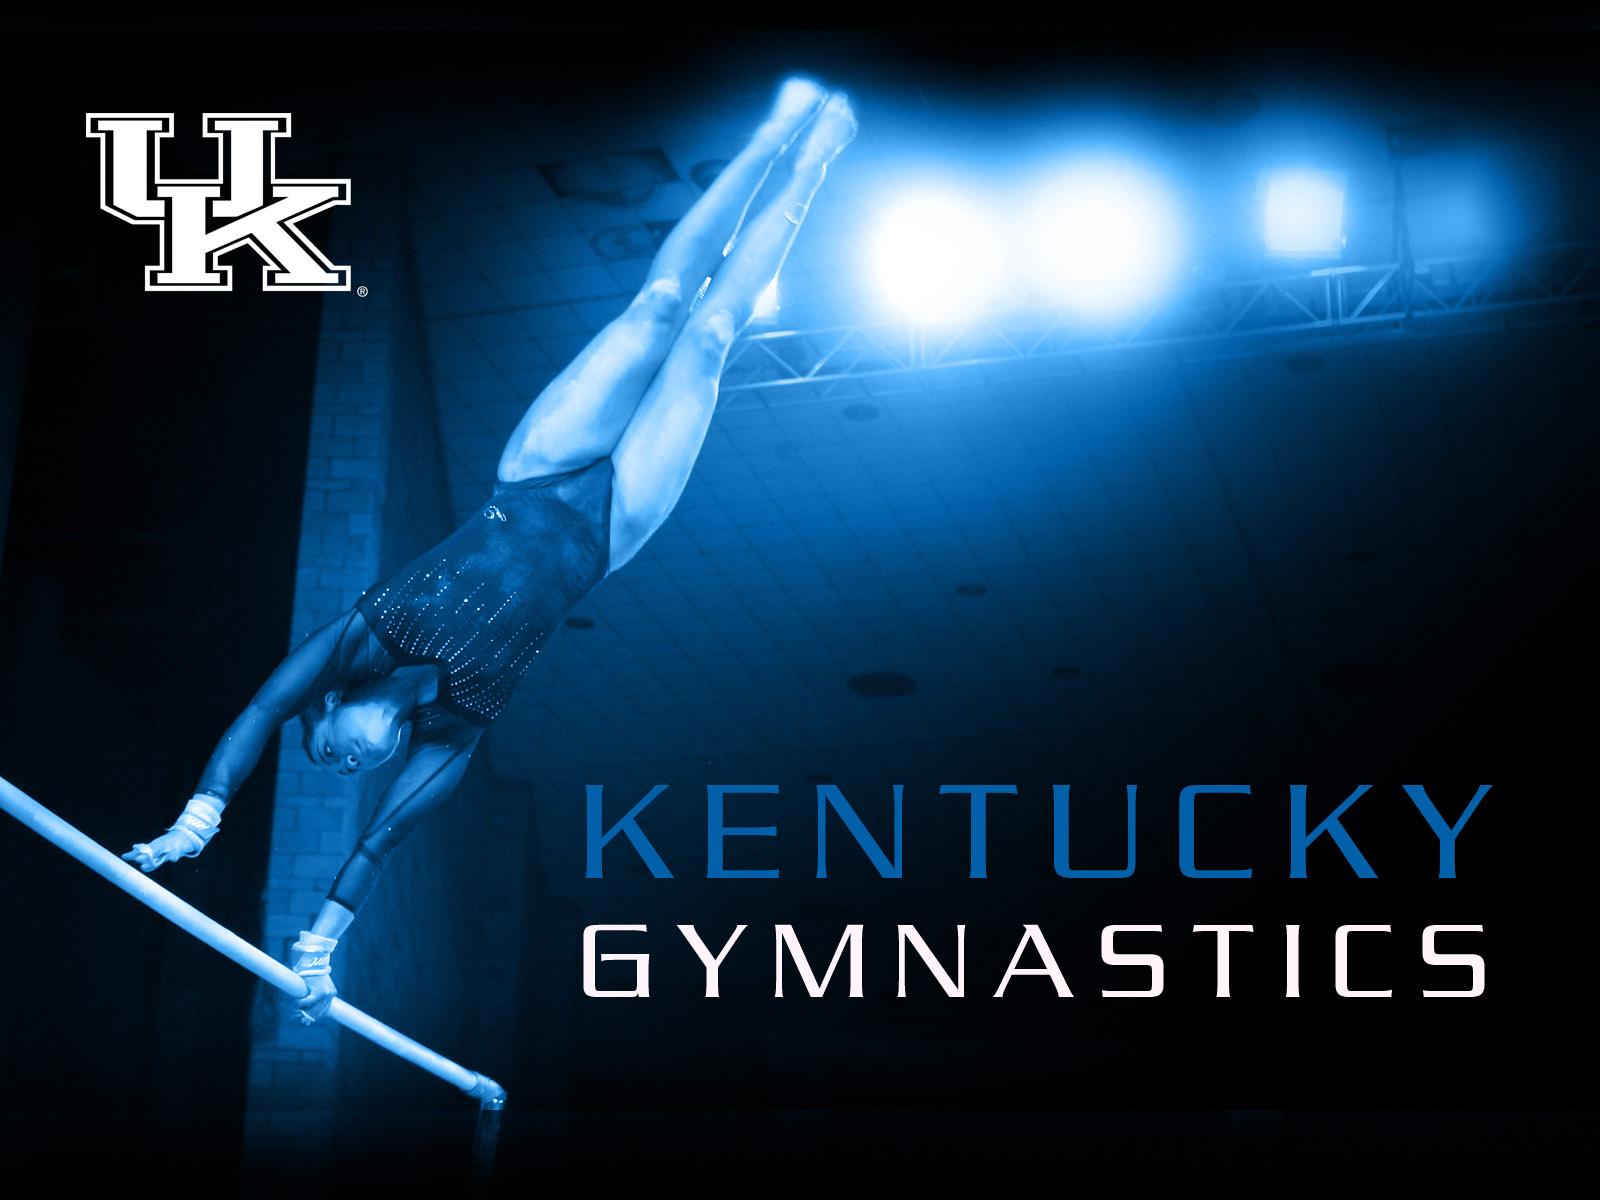 Cool Gymnastics Backgrounds Gymnastics 1600x1200